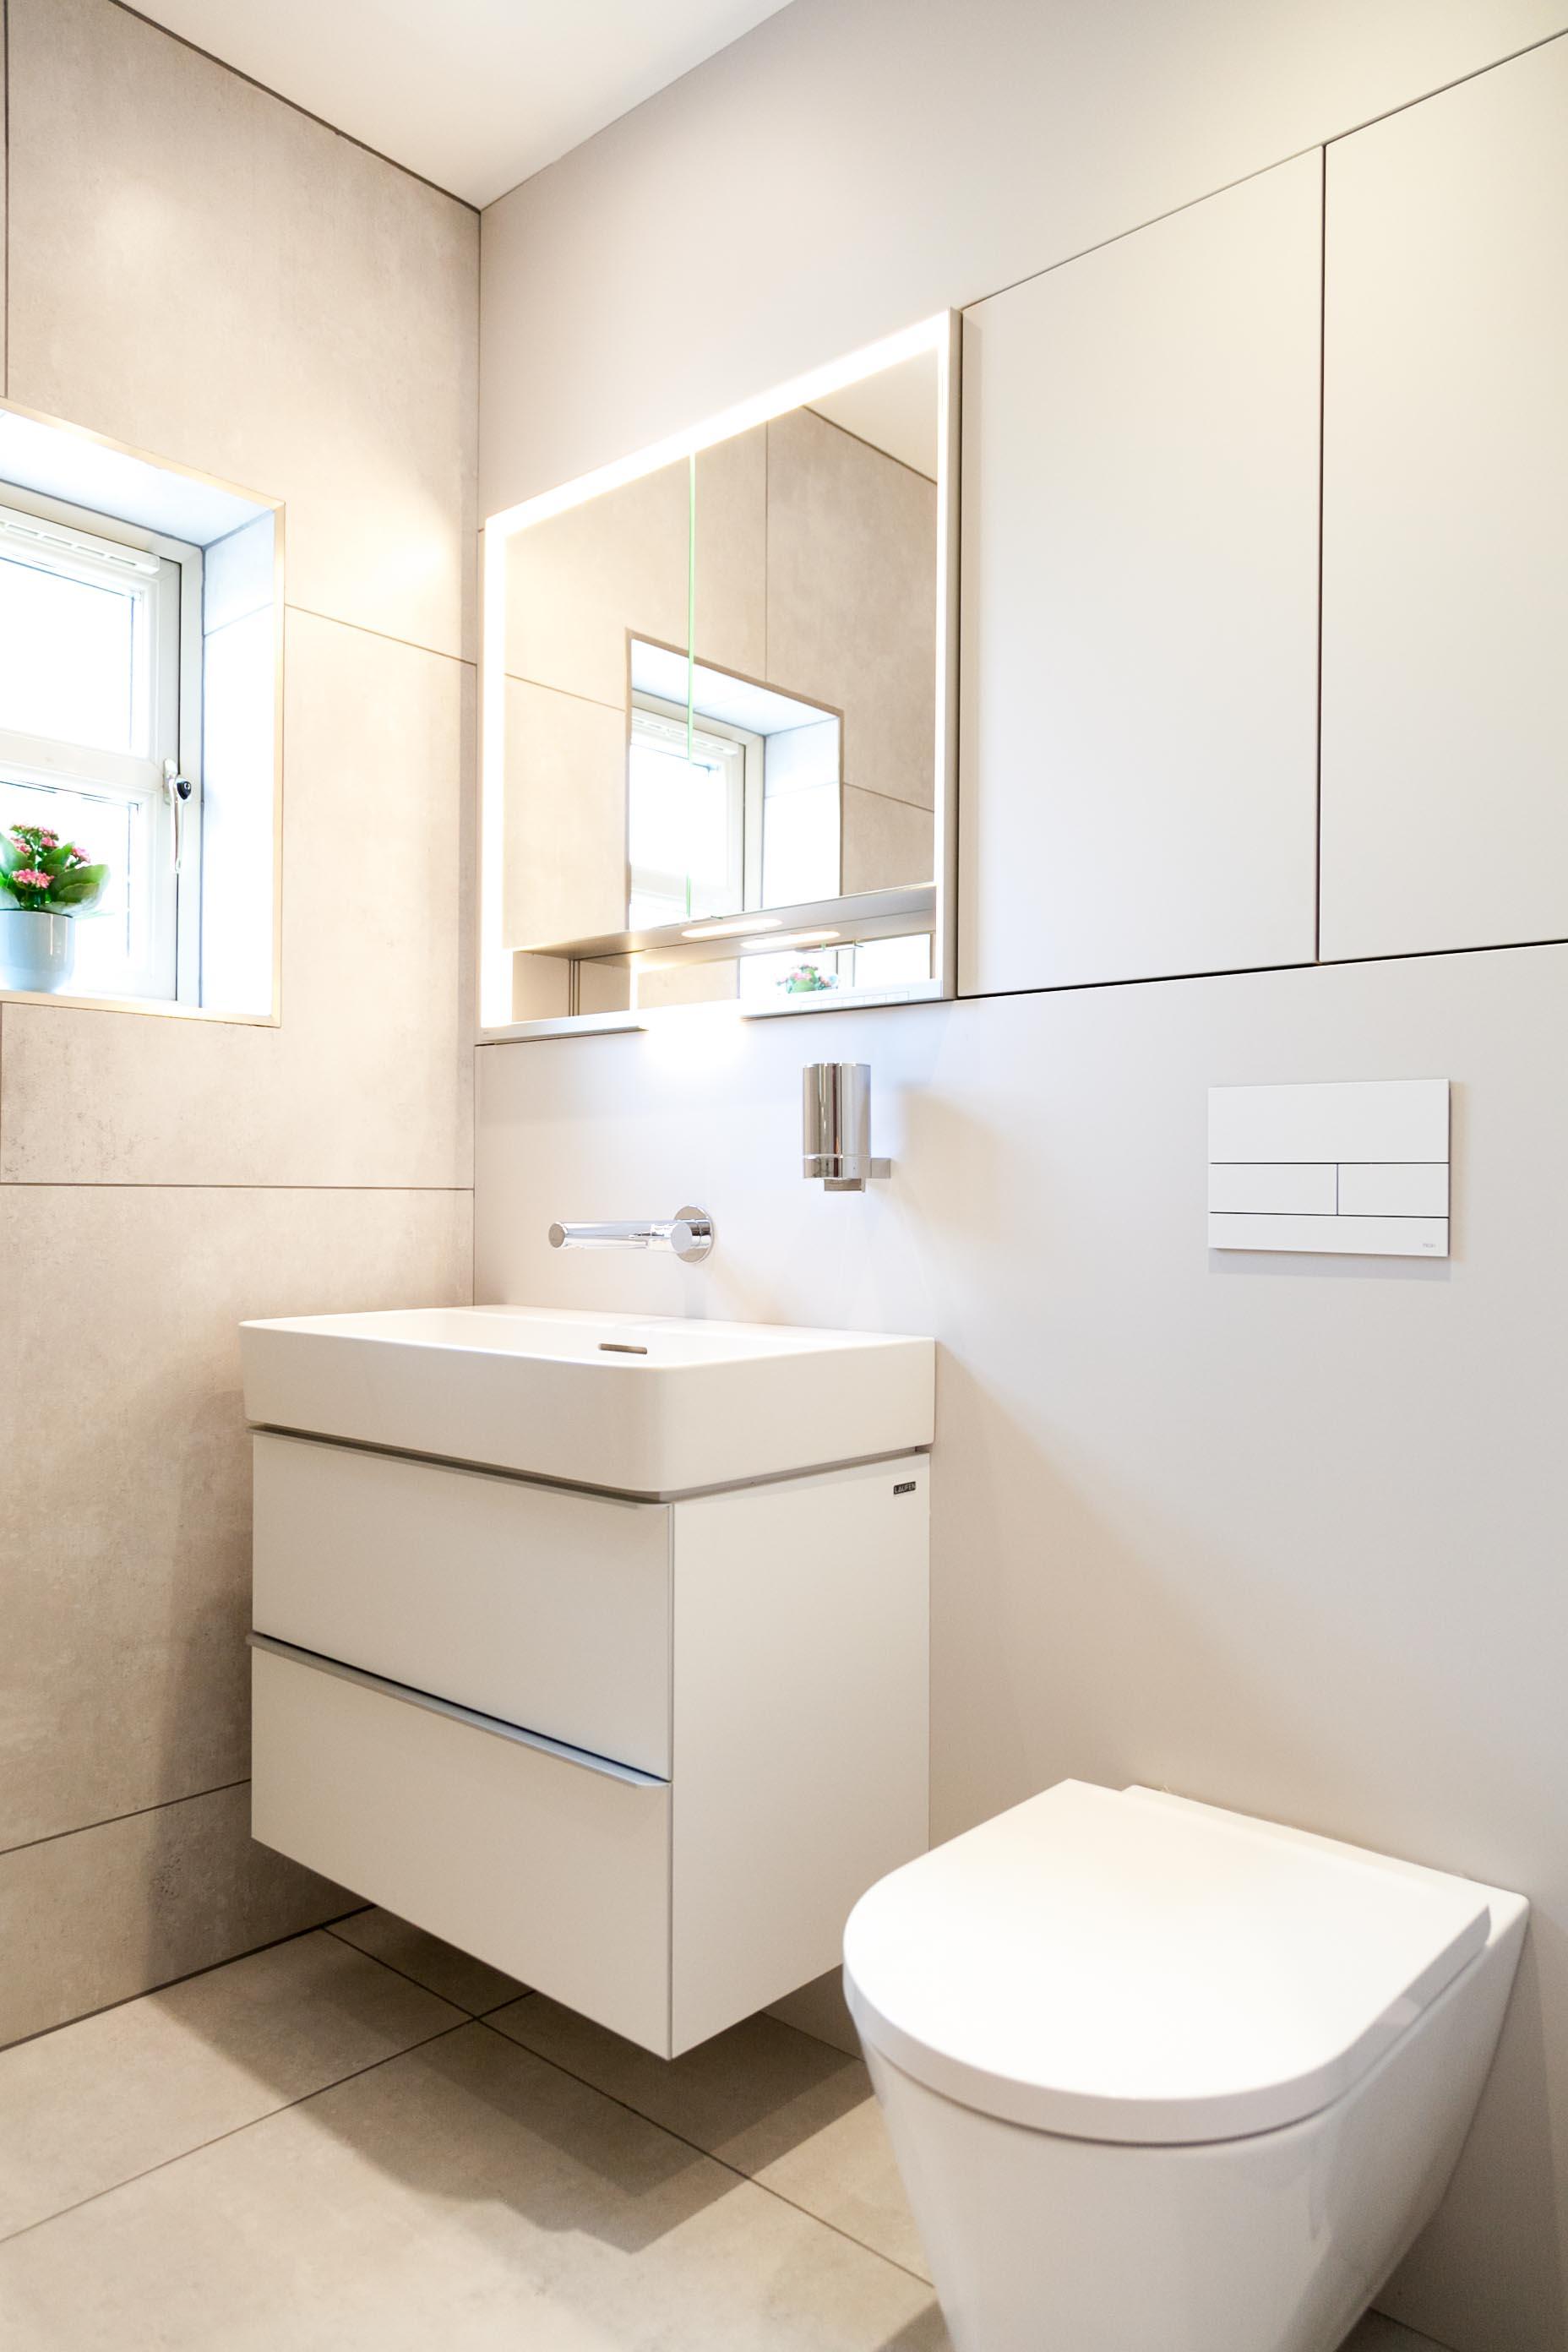 Kitchens Cirencester, Voga Interiors - Ashton Keynes Project